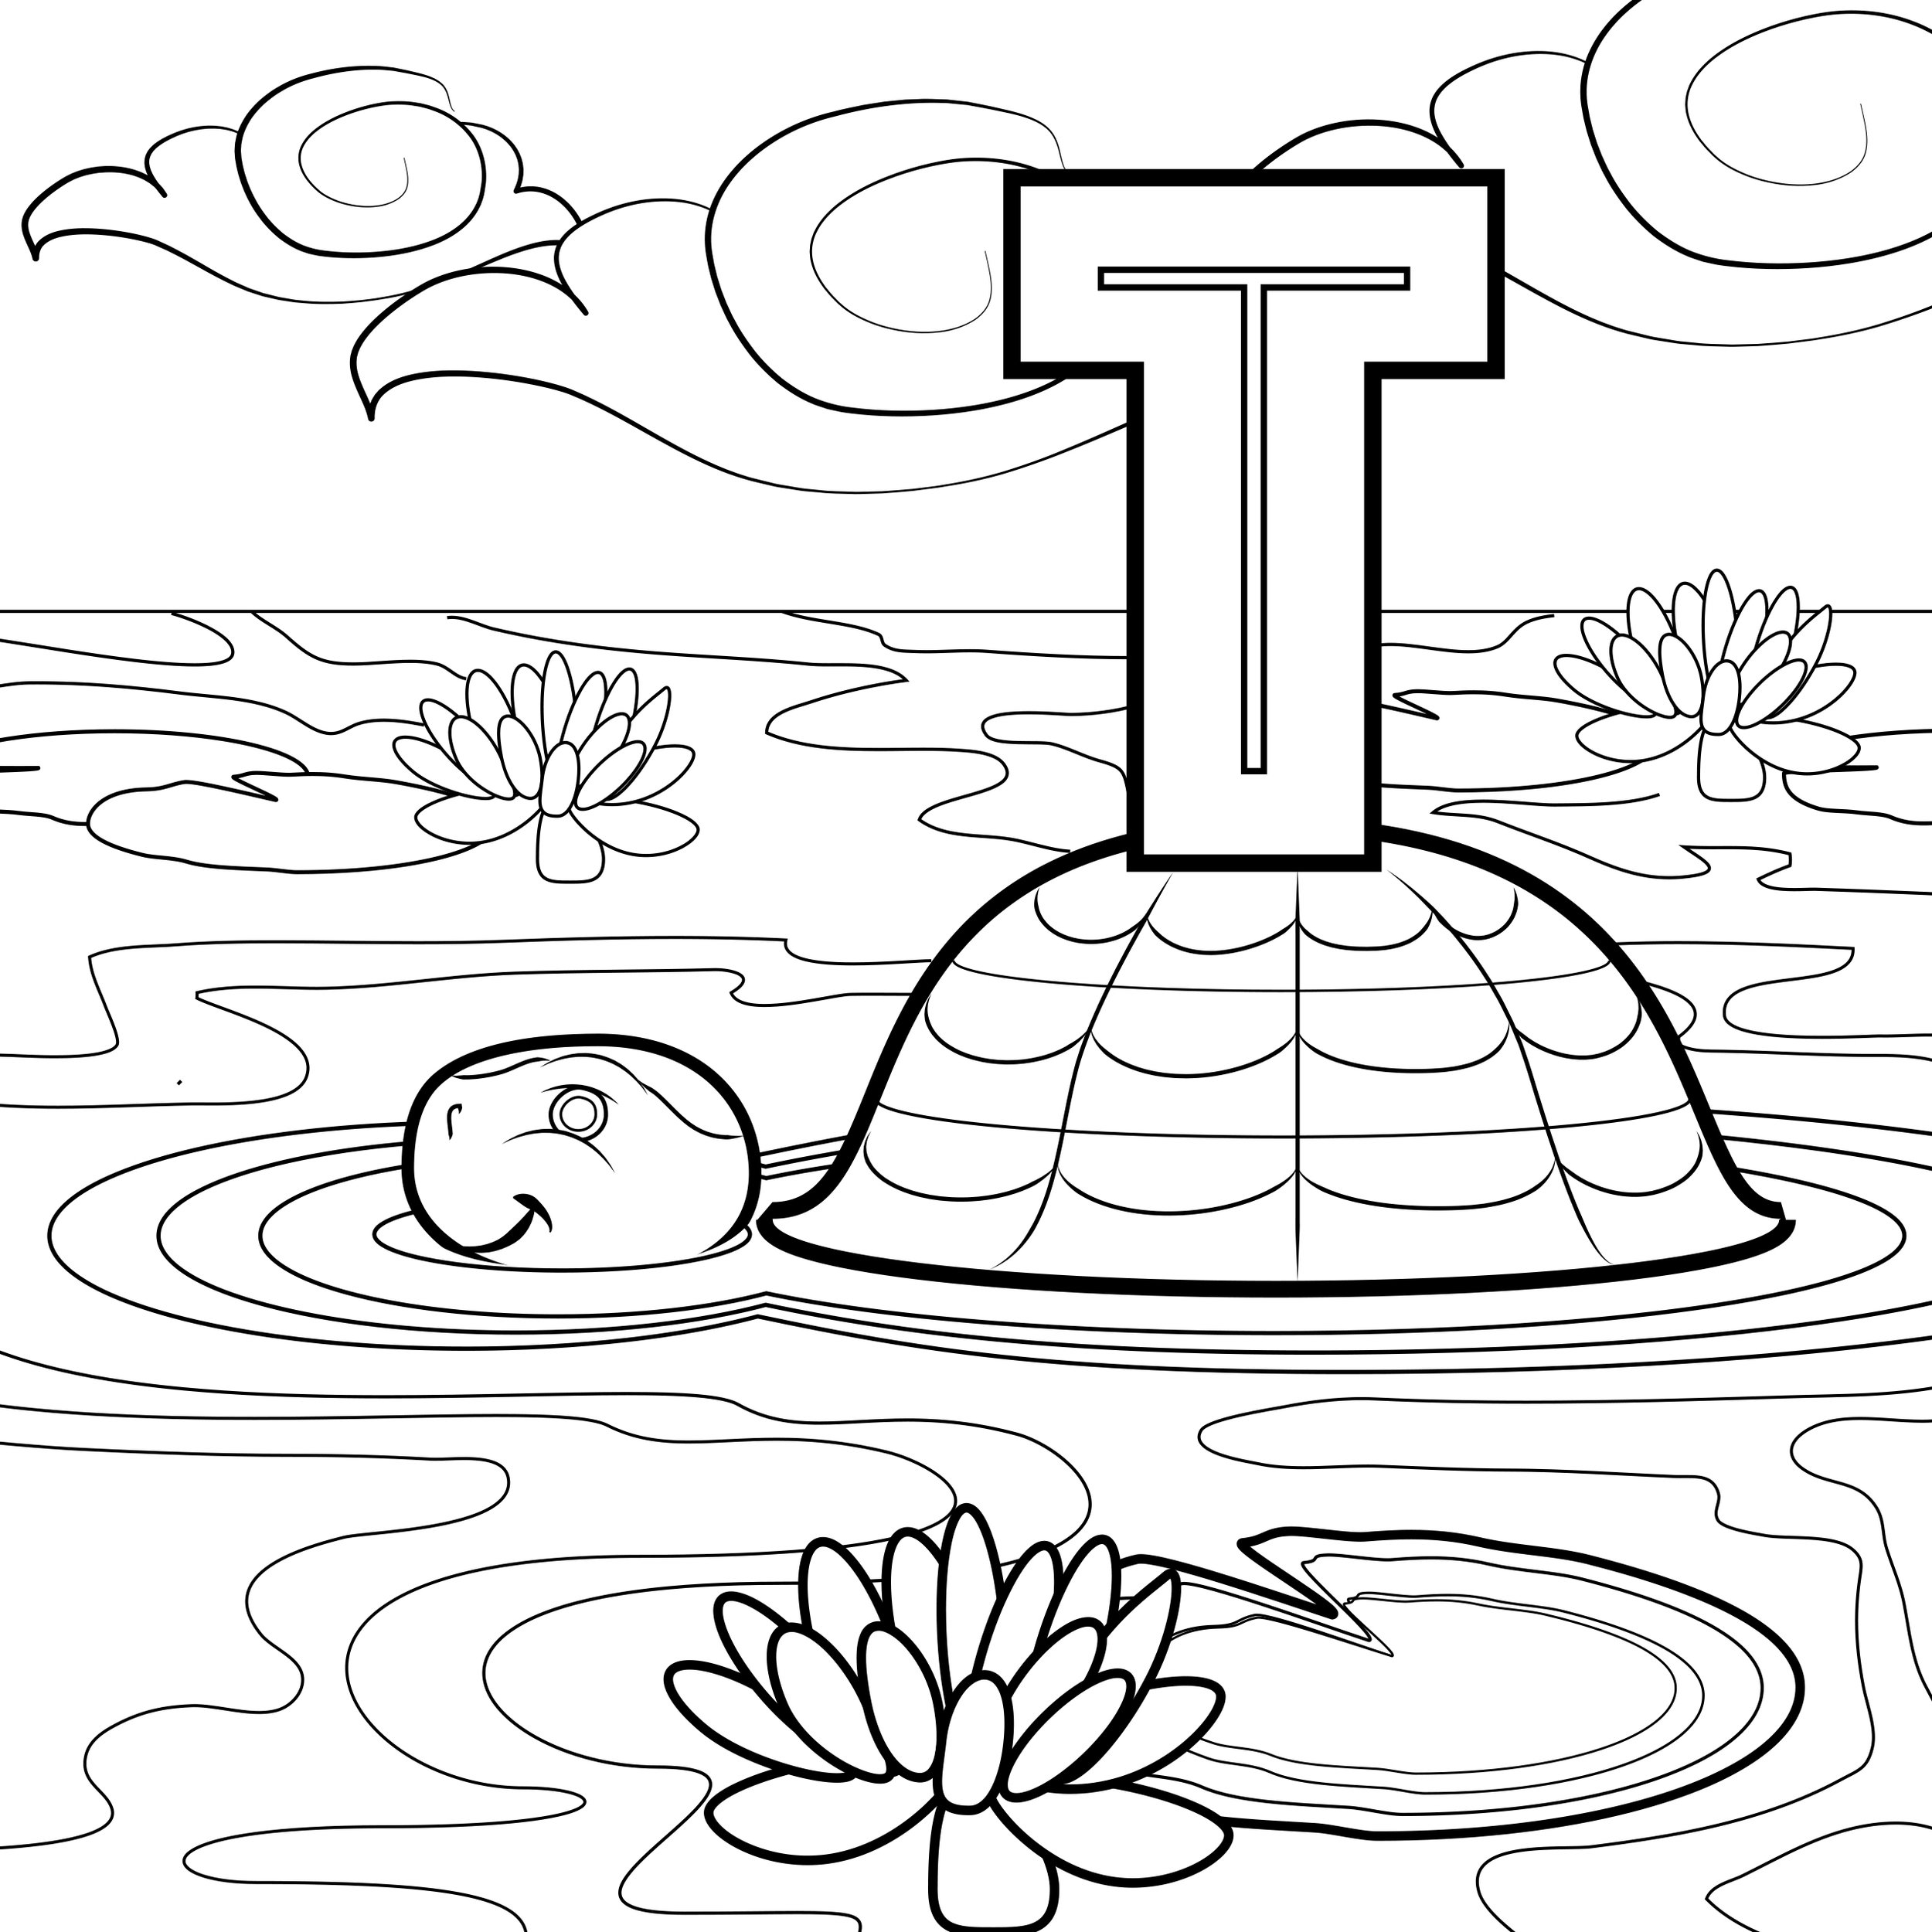 TP_Alphabet_T.jpg